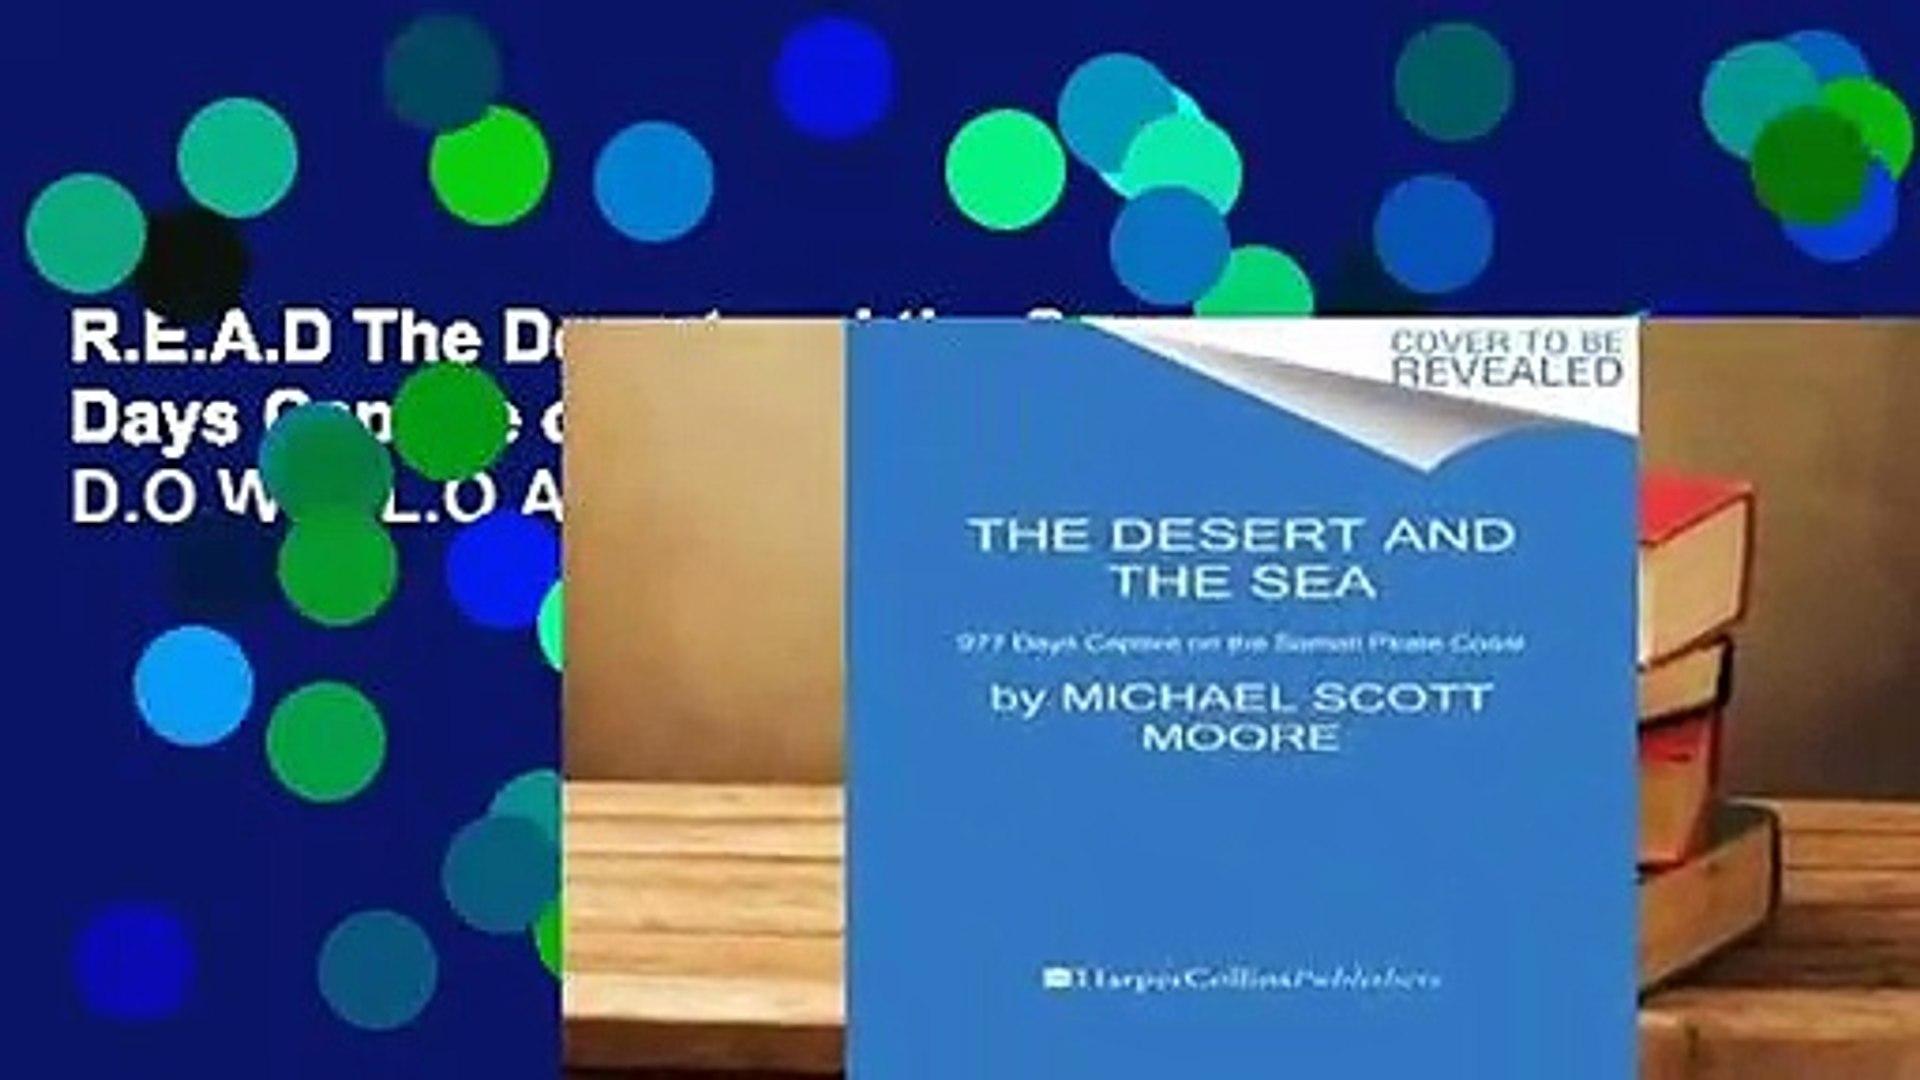 R.E.A.D The Desert and the Sea: 977 Days Captive on the Somali Pirate Coast D.O.W.N.L.O.A.D